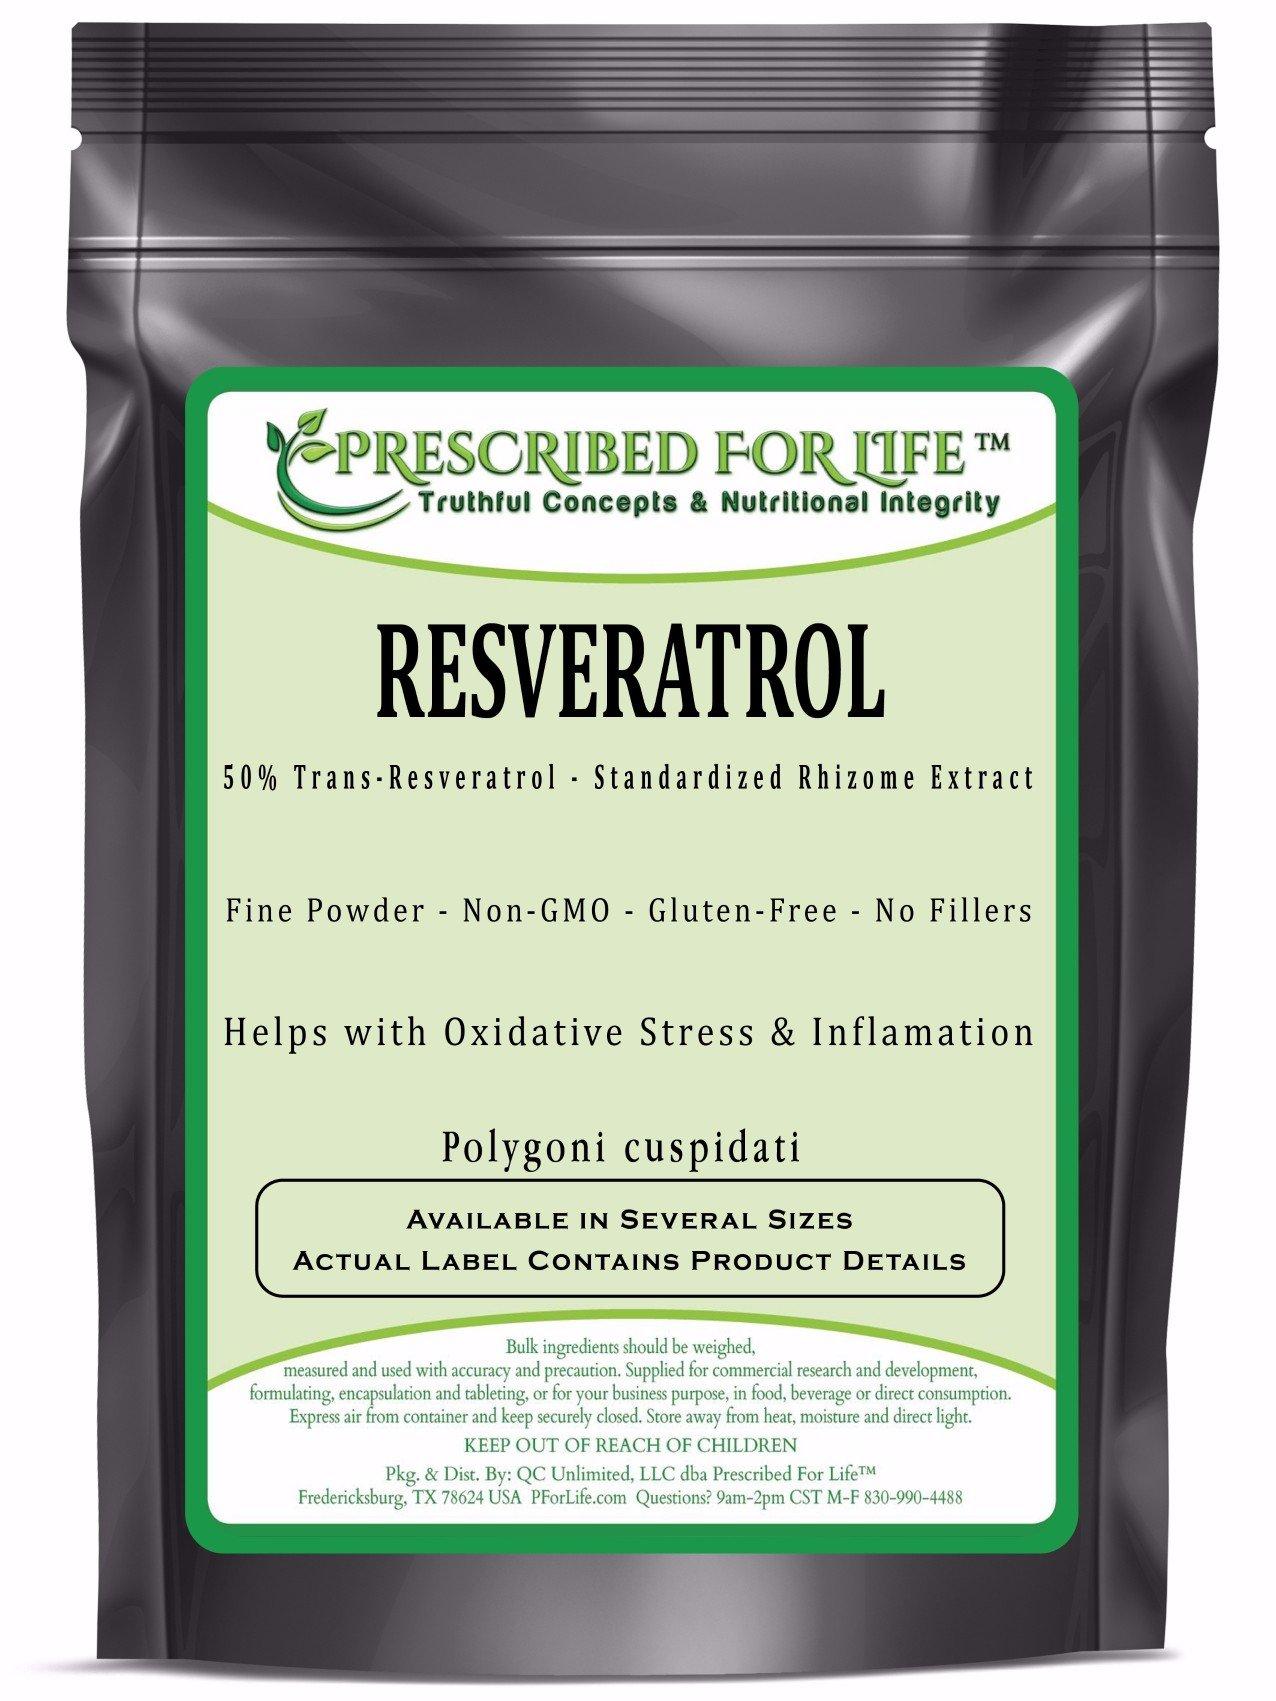 Resveratrol - 50% Trans-Resveratrol - Natural Rhizome Extract Powder (Polygoni cuspidatium), 1 kg